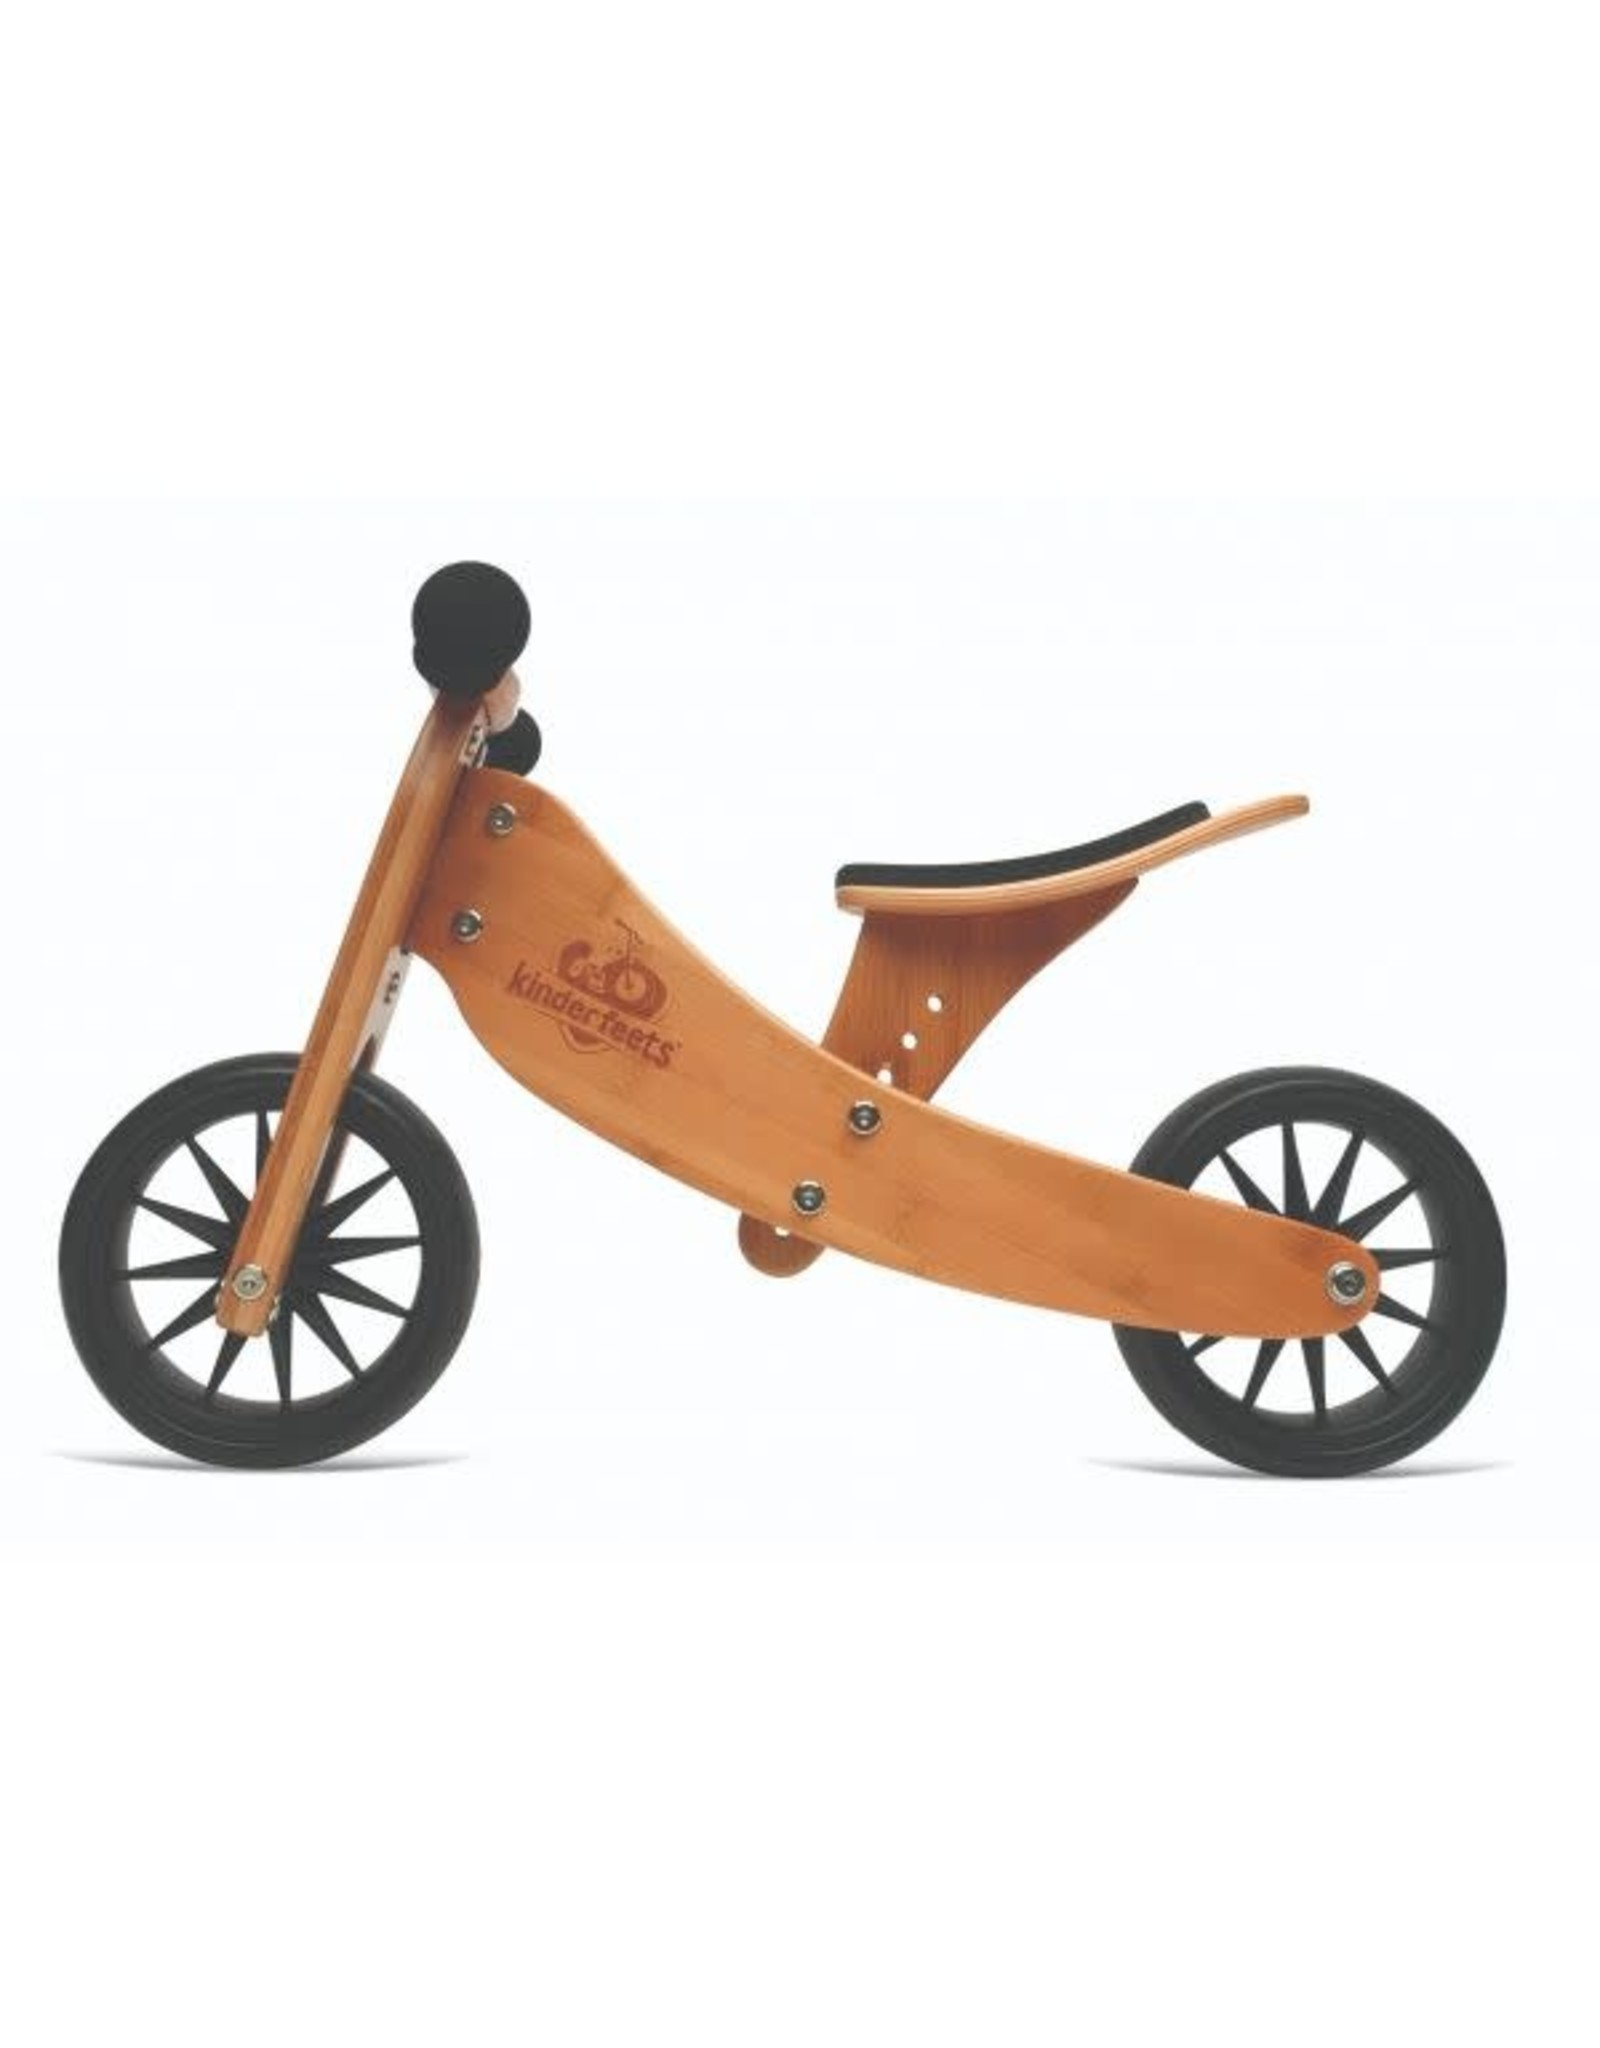 Kinderfeets Kinderfeets Tiny Tot Bamboo Balance Bike